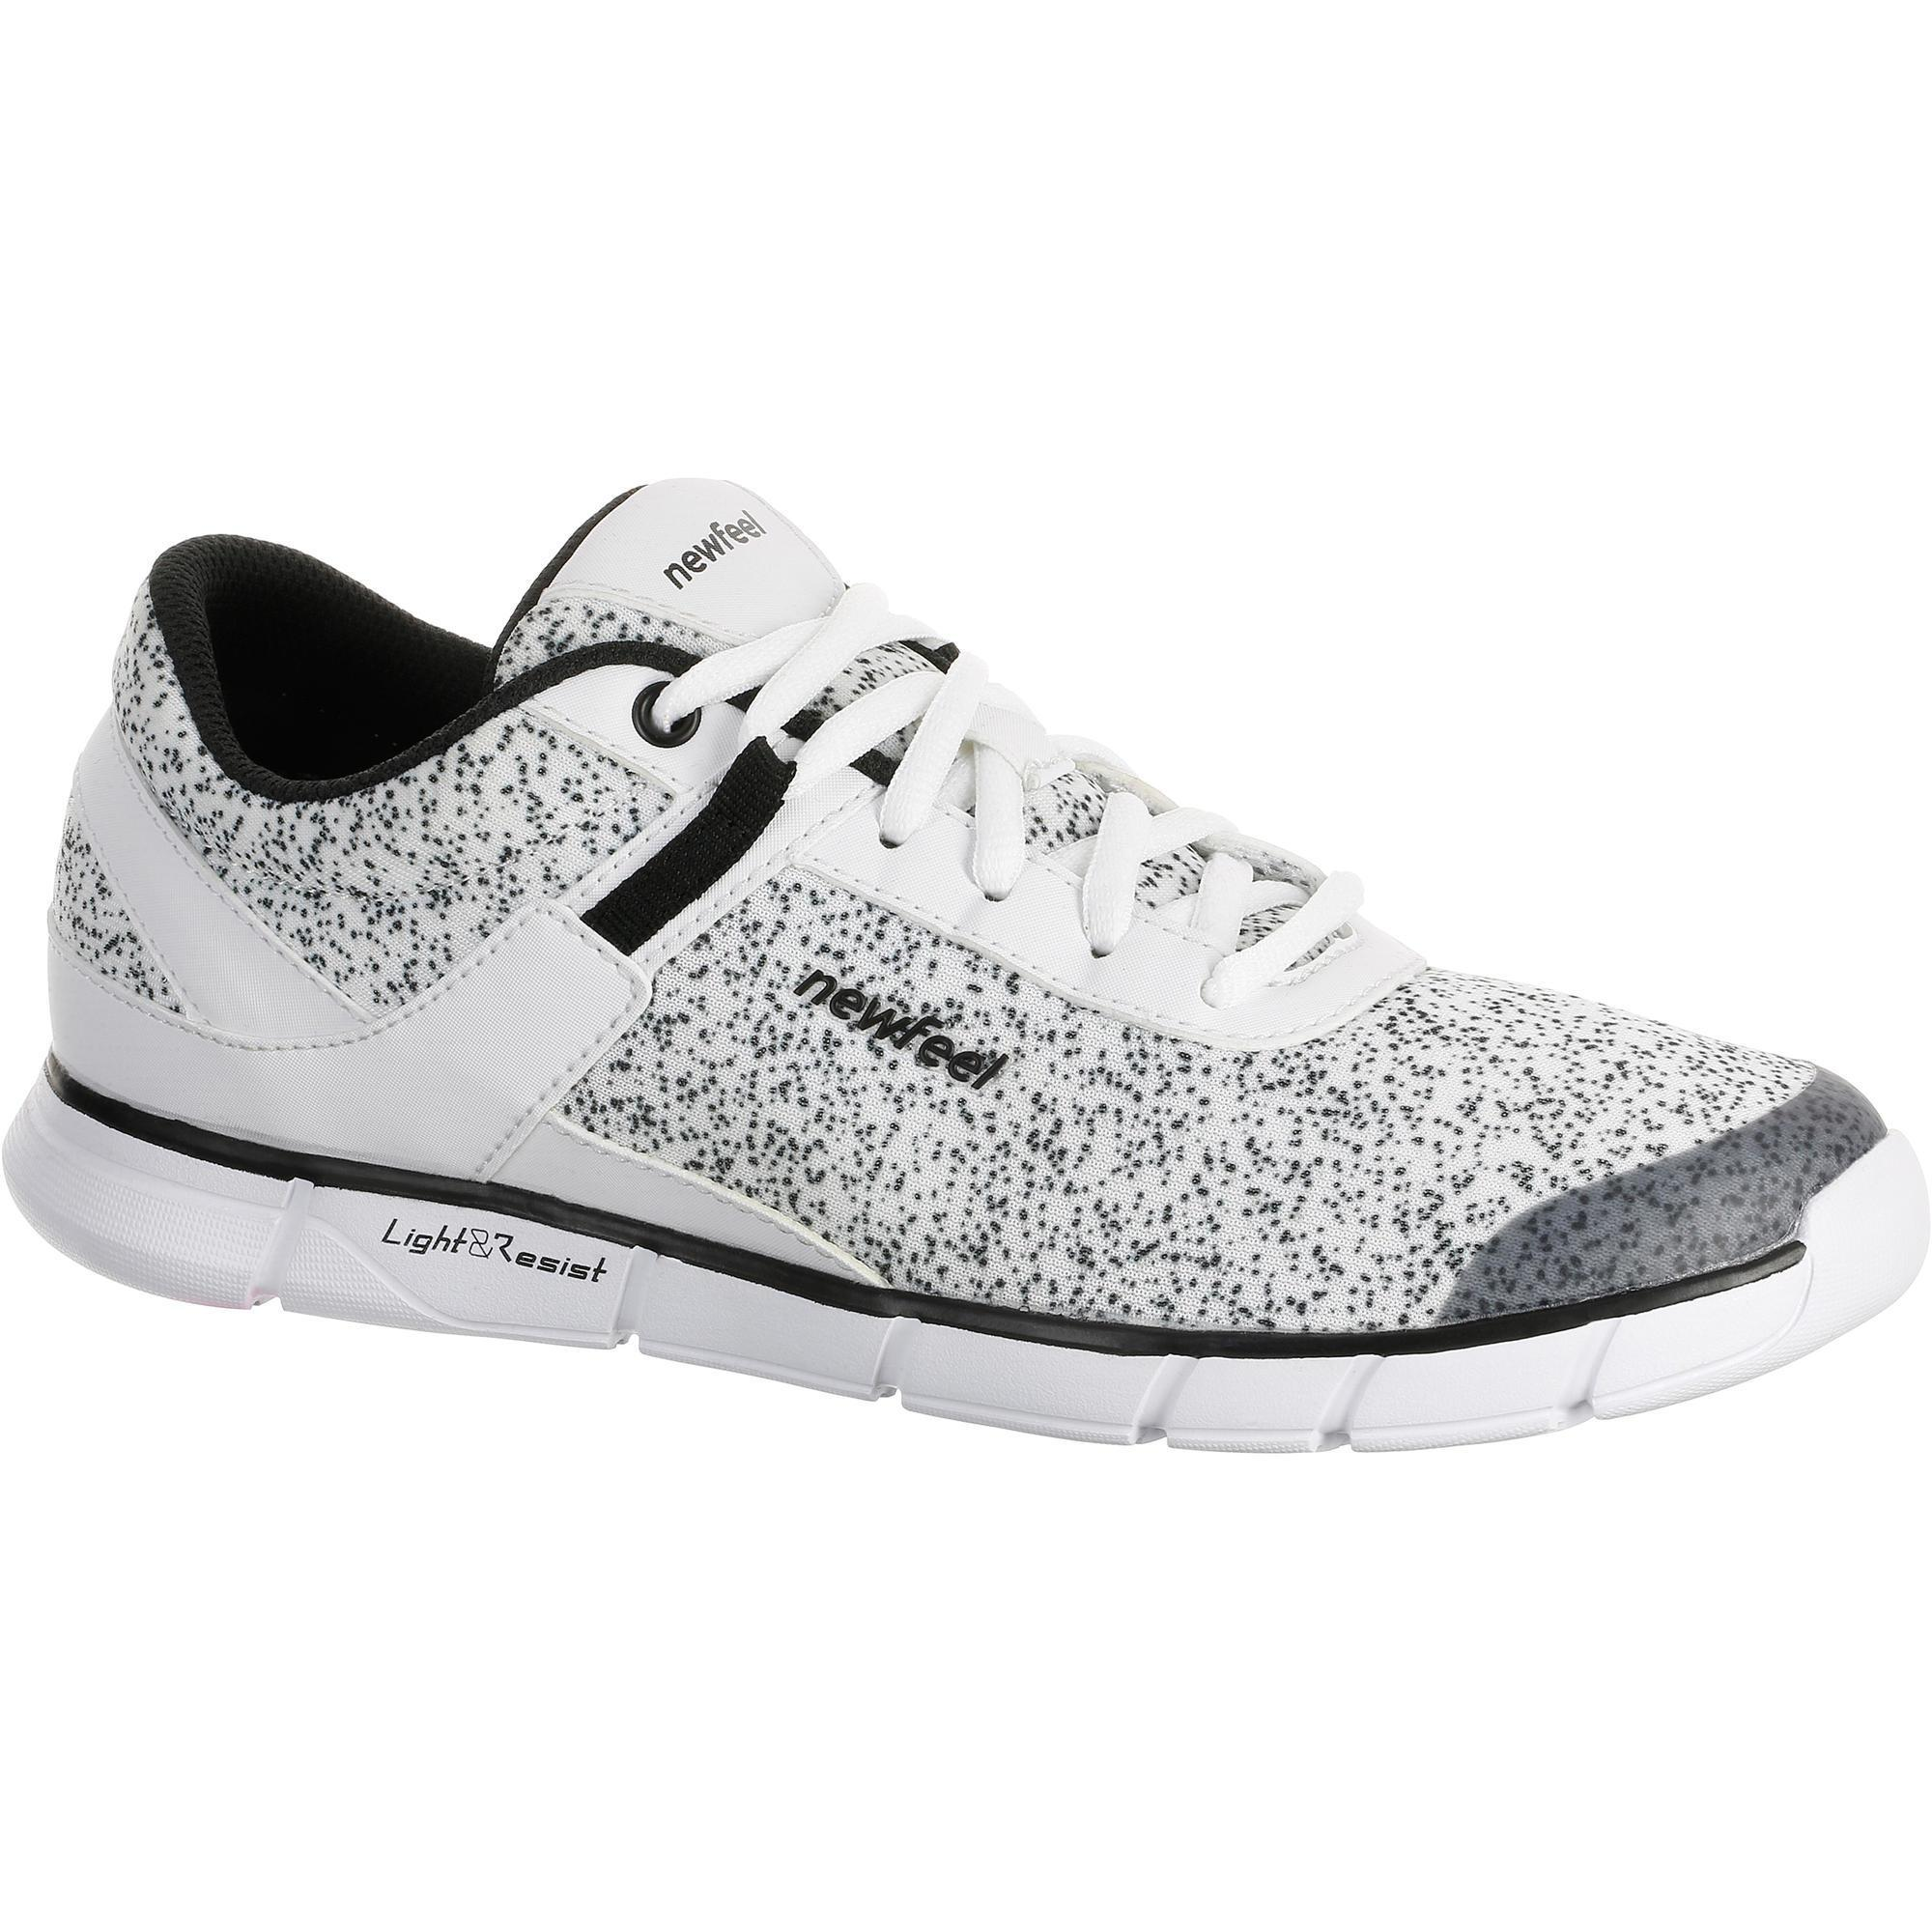 f796b71b77a Soft 540 Women s Fitness Walking Shoes - Mottled White